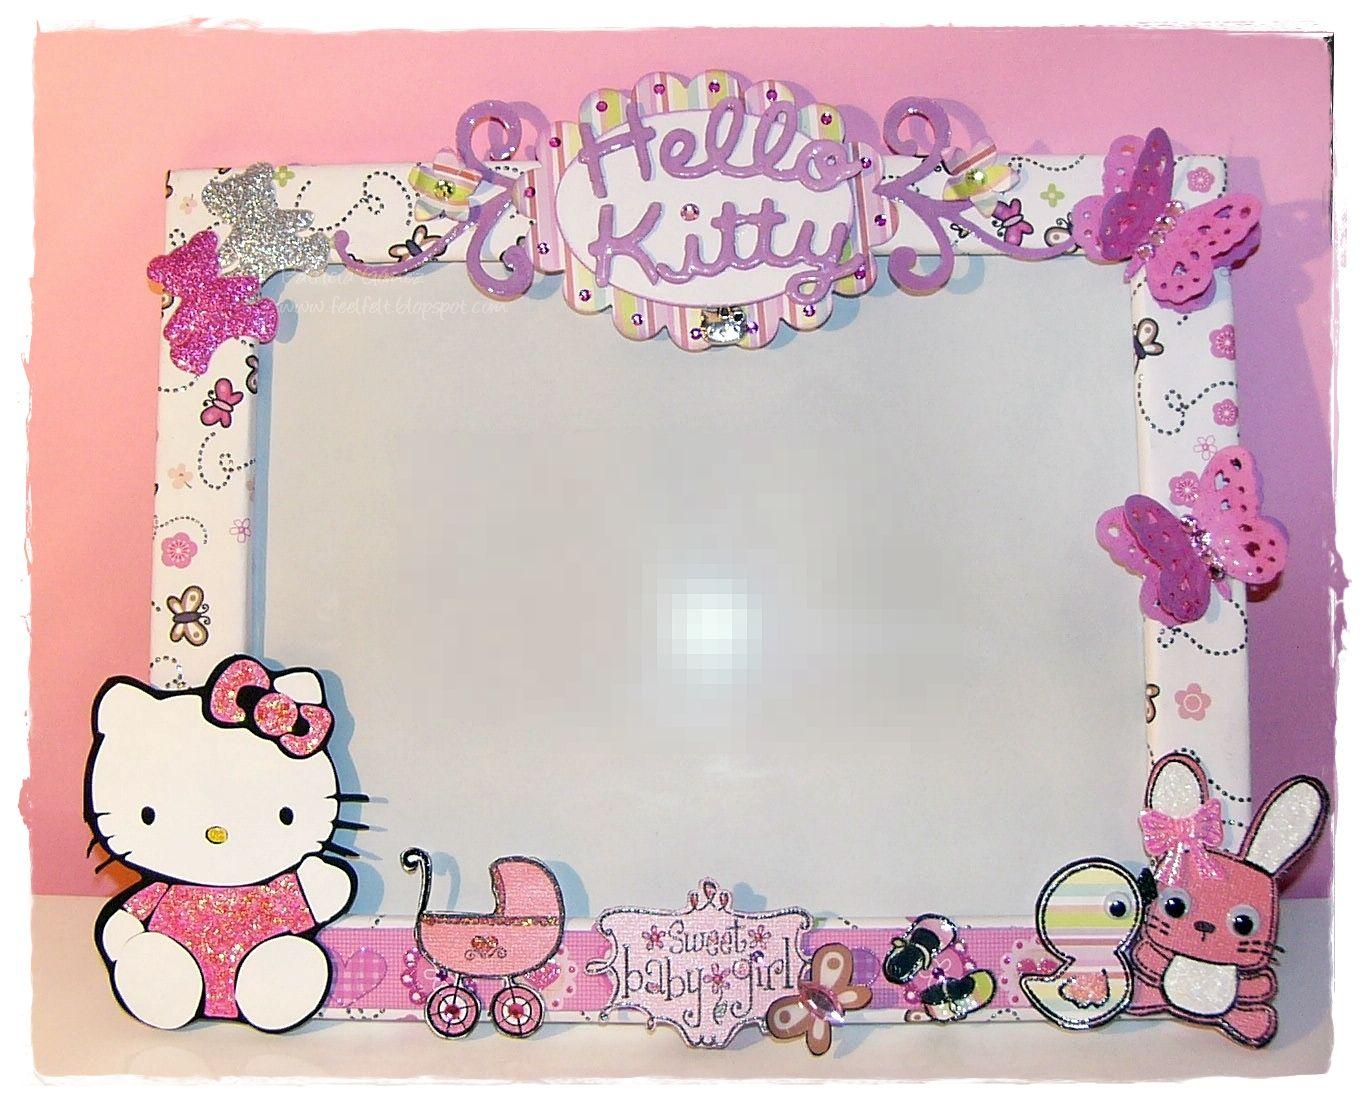 Hello Kitty Picture Frame | ... de la craft tanto el texto de Hello Kitty como la propia gatita